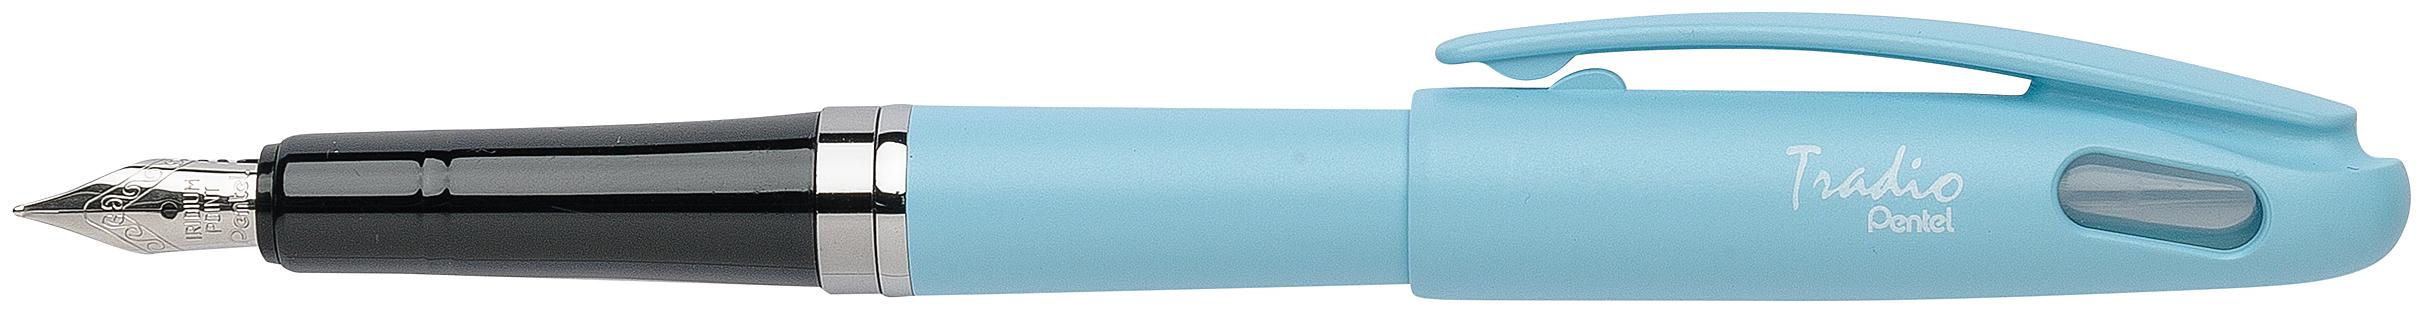 Pentel Tradio Pastel - Stylo plume - corps bleu